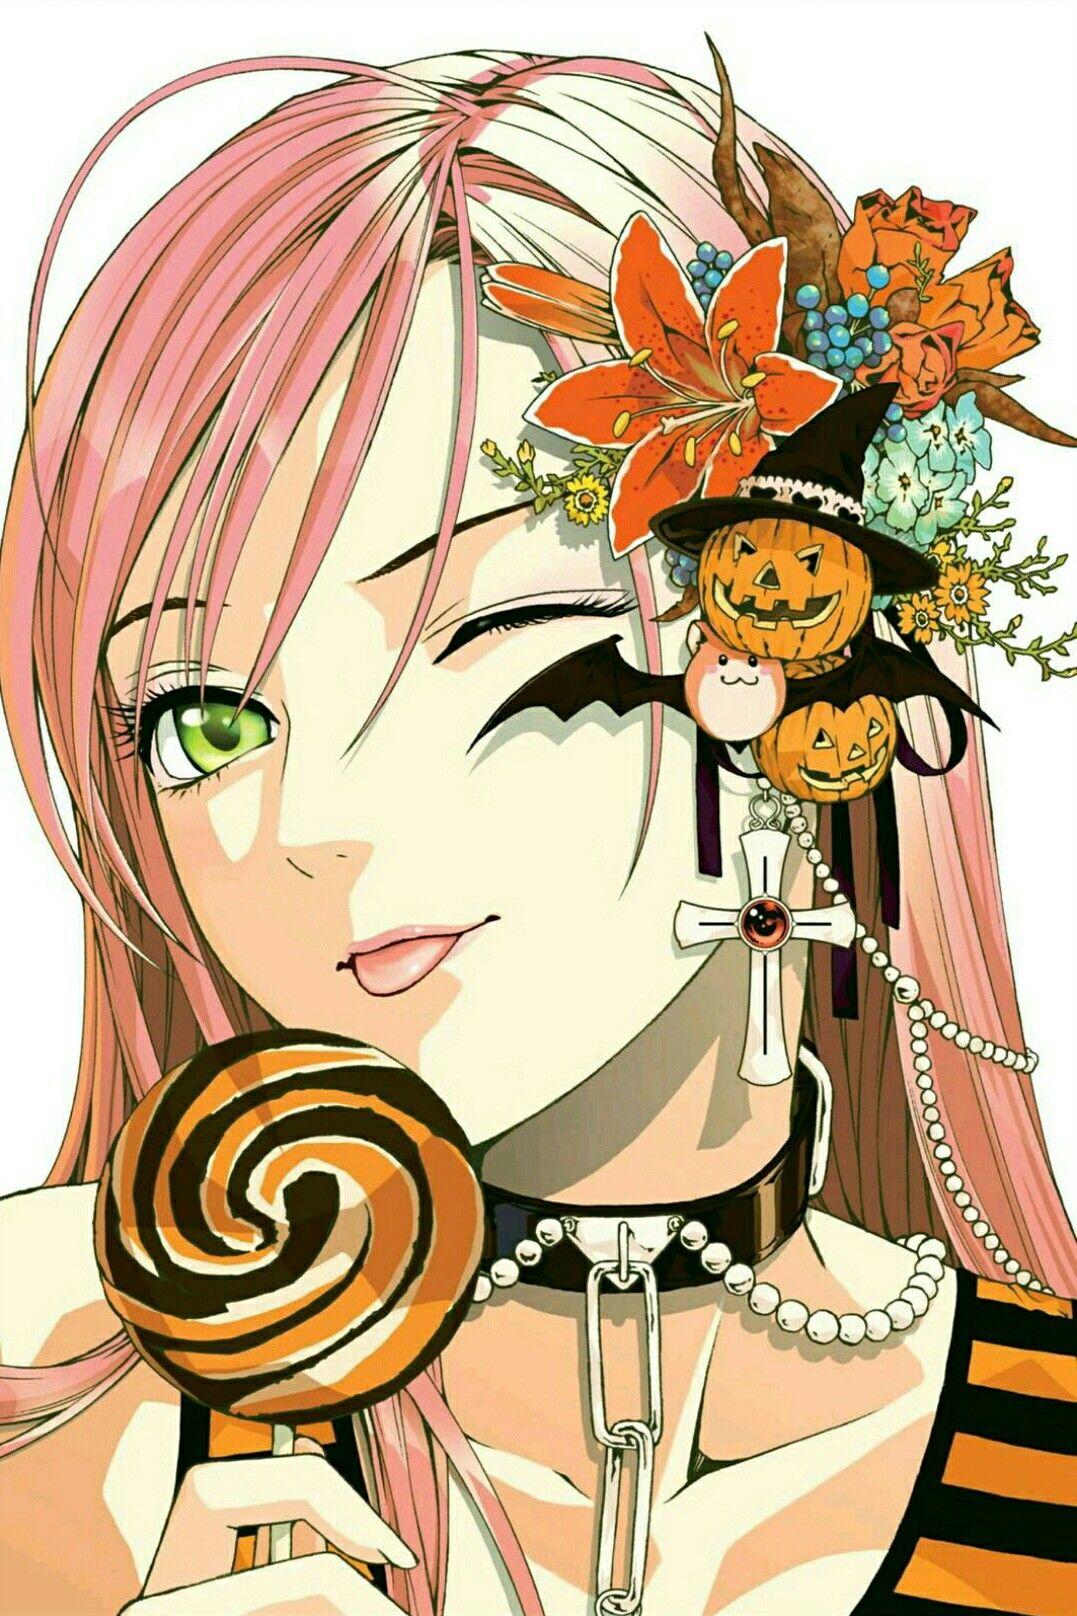 Pin by Tiu Hen on vampire/rosario Rosario vampire anime